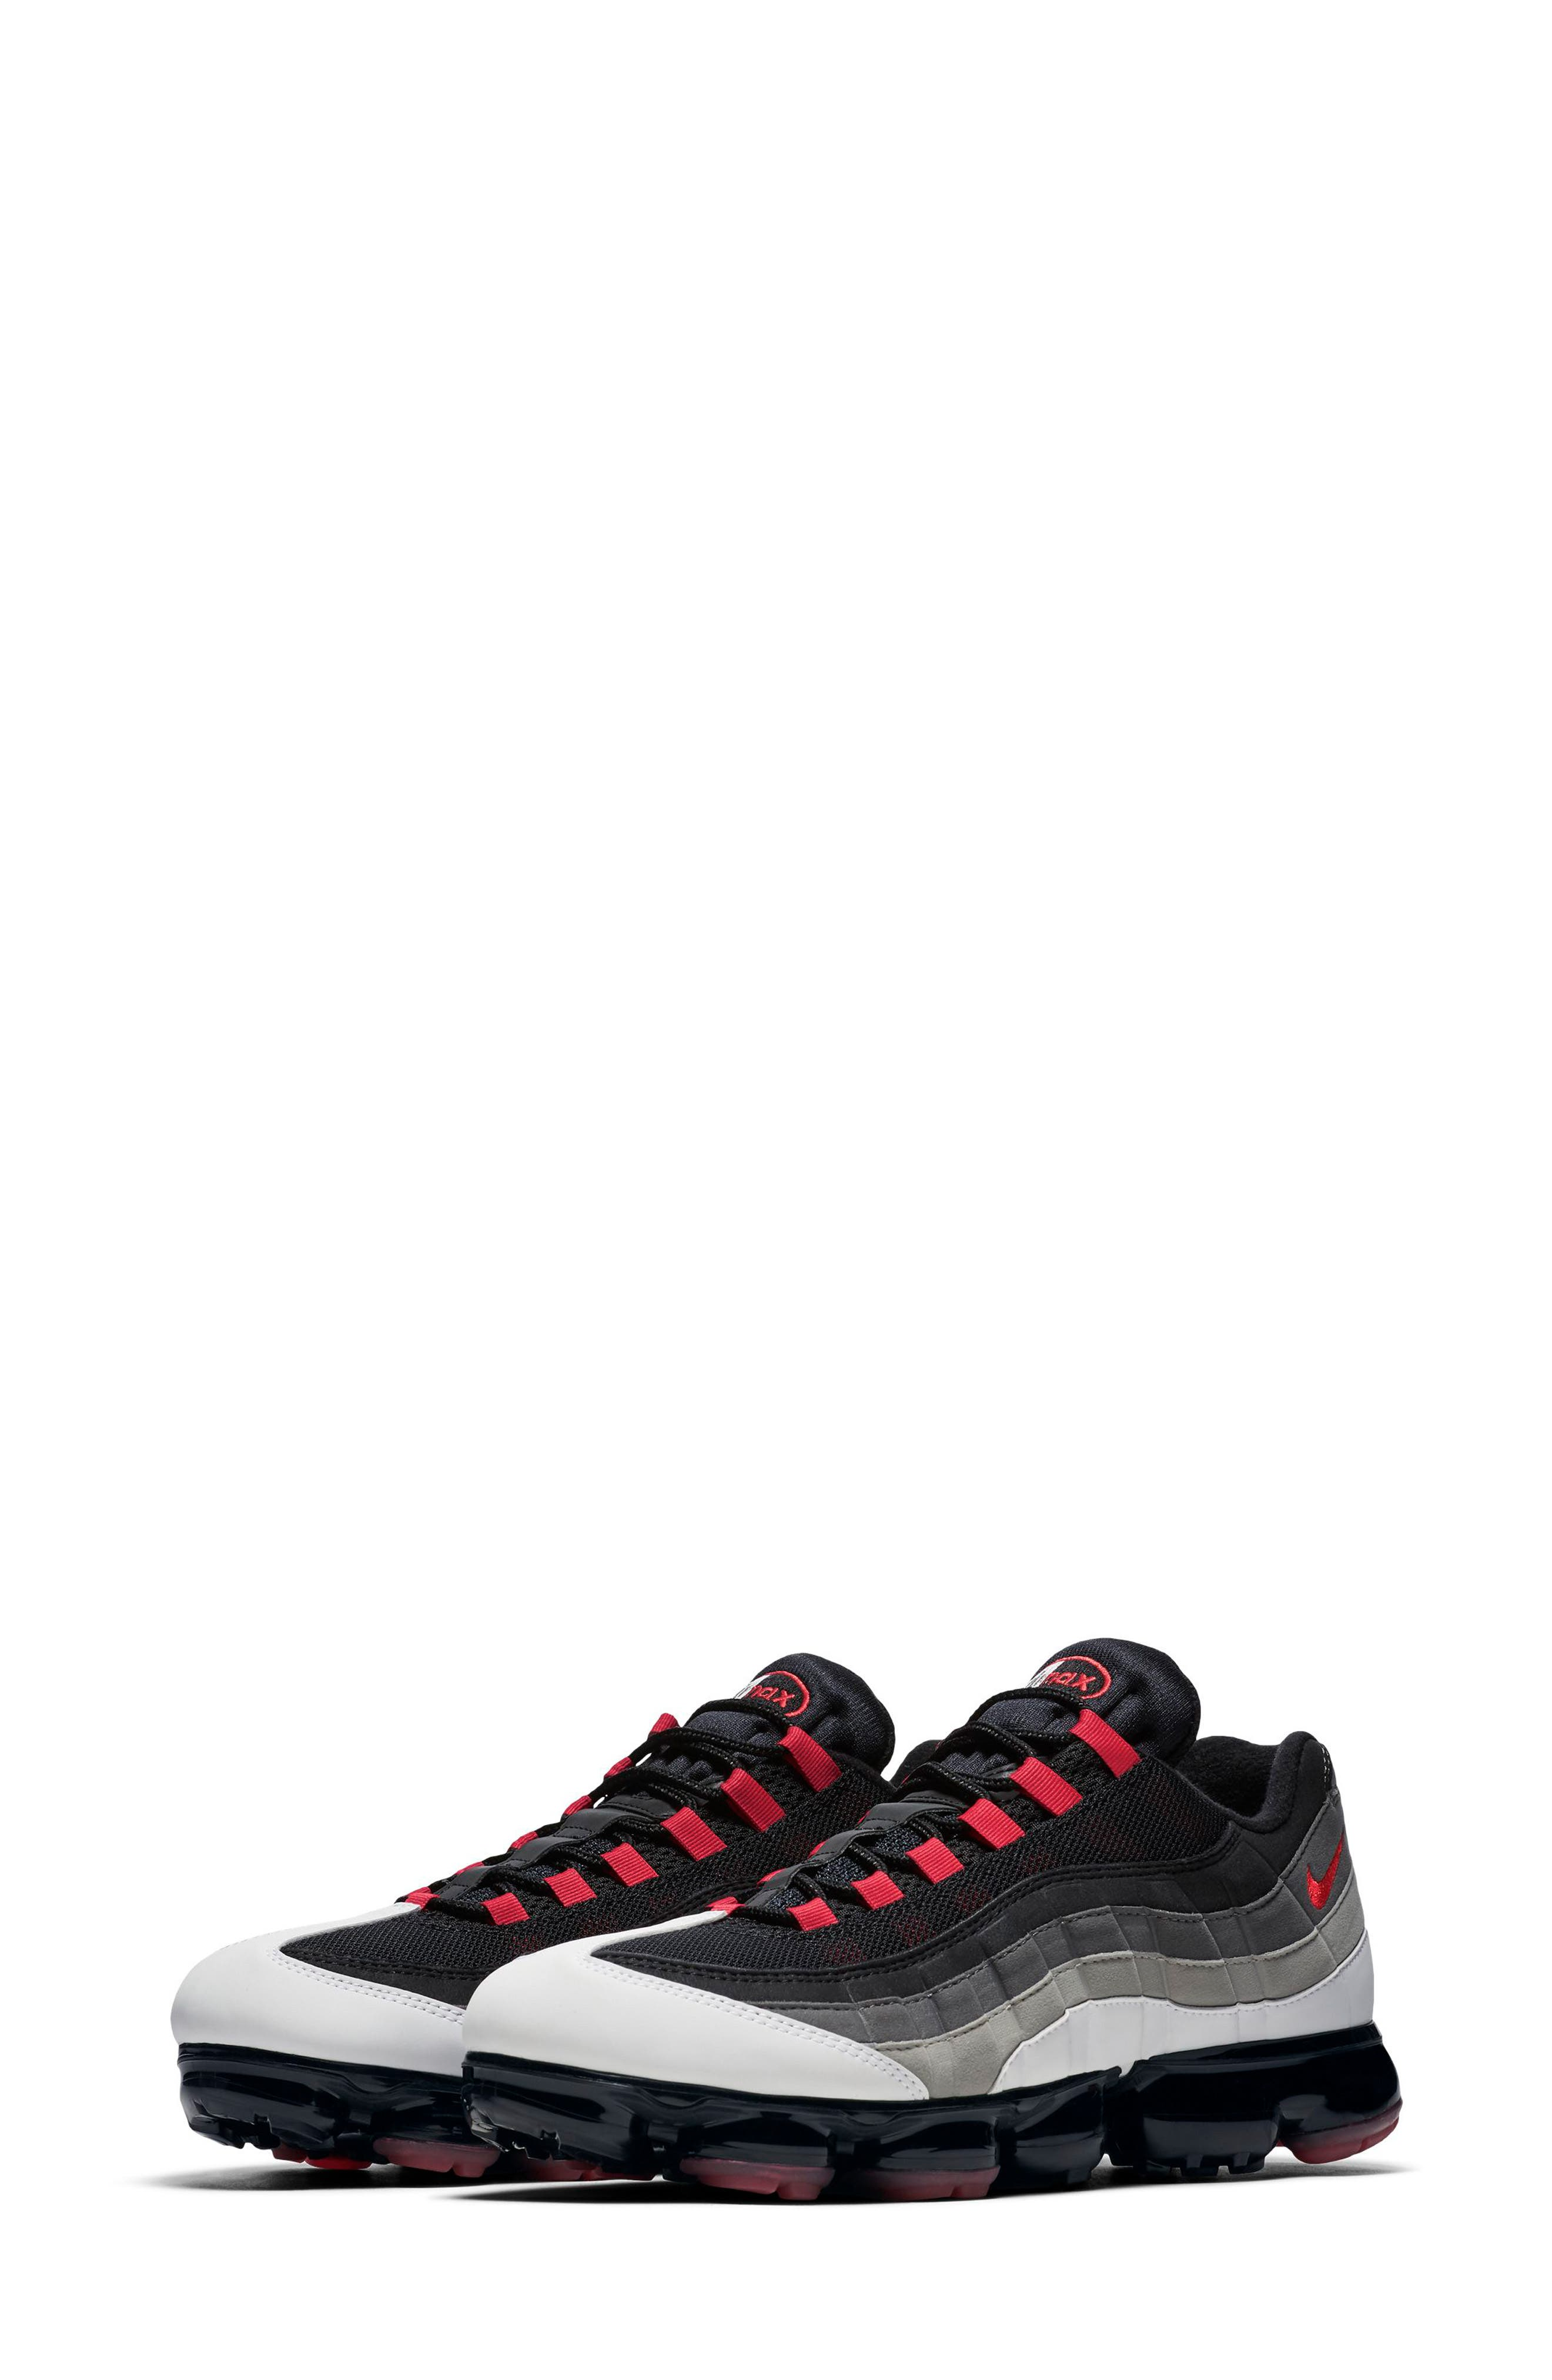 Air VaporMax '95 Sneaker,                             Main thumbnail 1, color,                             WHITE/ RED/ PEWTER/ GRANITE